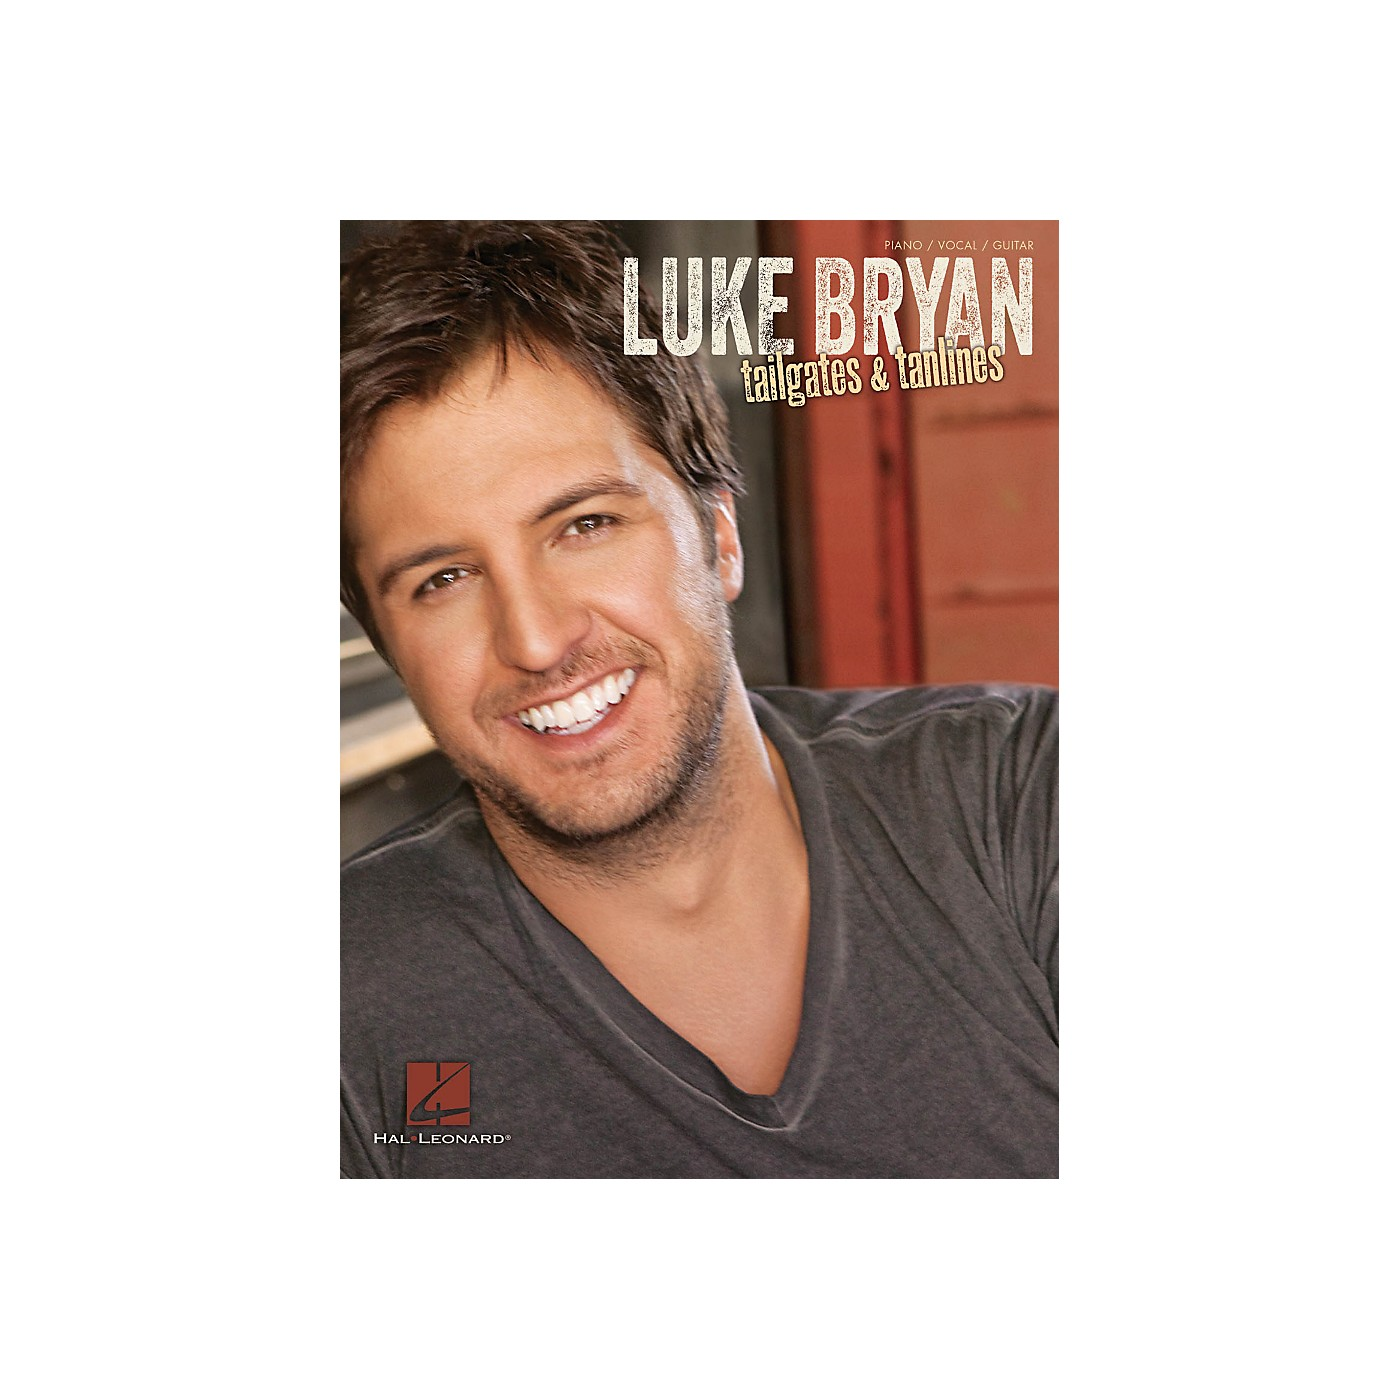 Hal Leonard Luke Bryan - Tailgates & Tanlines for Piano/Vocal/Guitar thumbnail